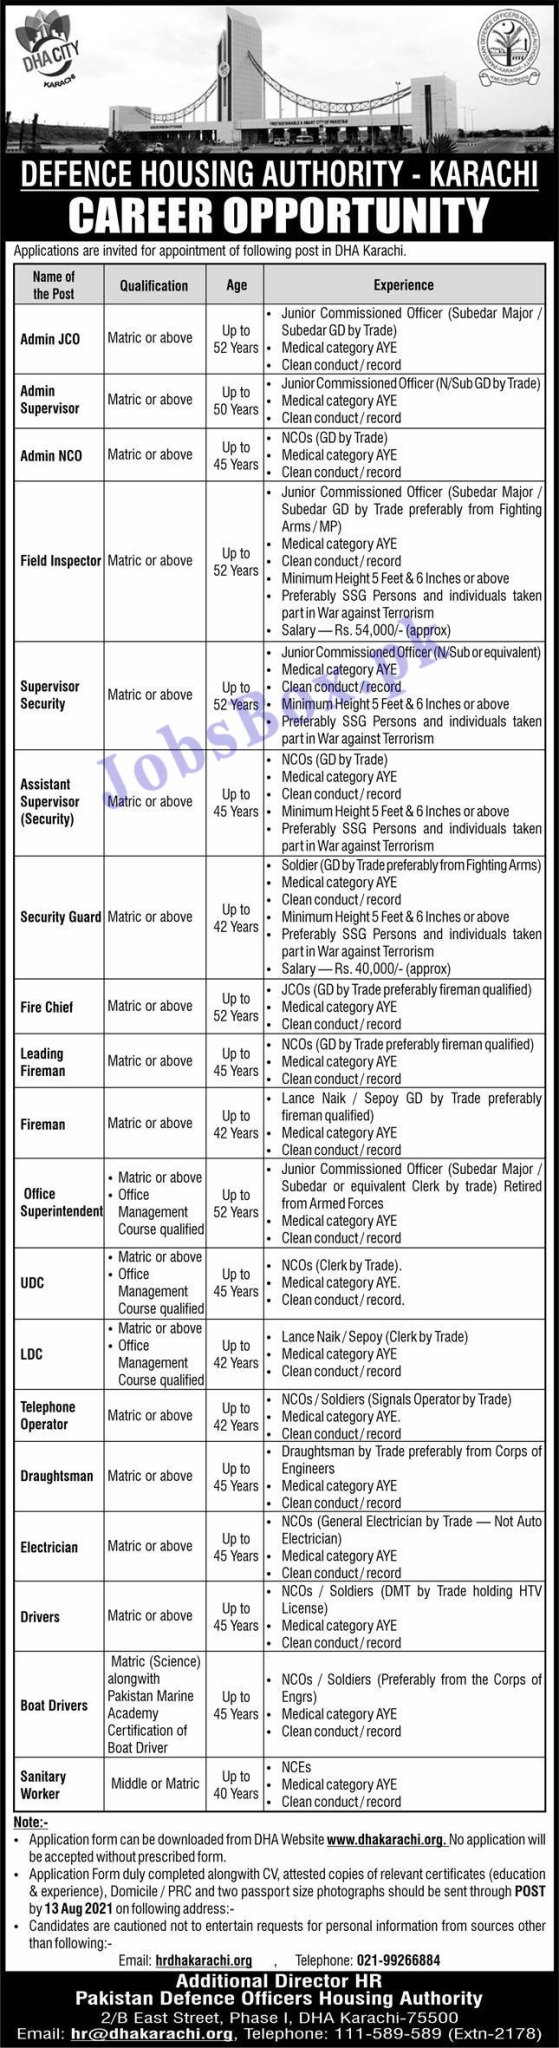 www.dhakarachi.org Jobs 2021 - Defence Housing Authority DHA Karachi Jobs 2021 in Pakistan